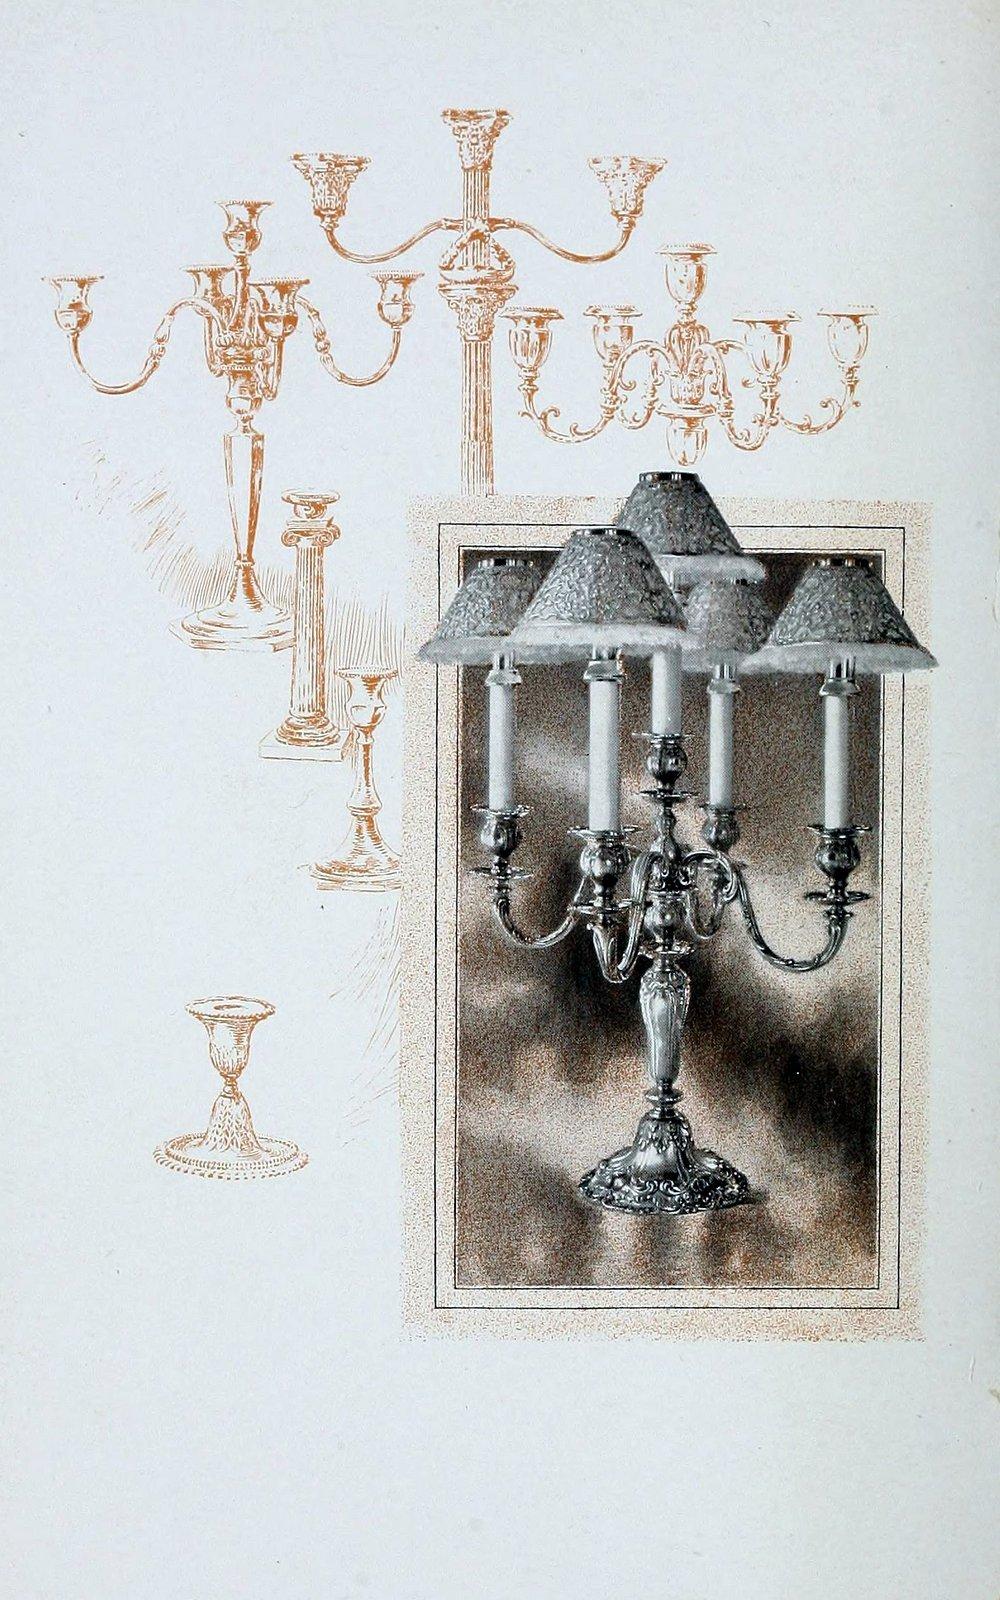 Candelabra and Candlesticks